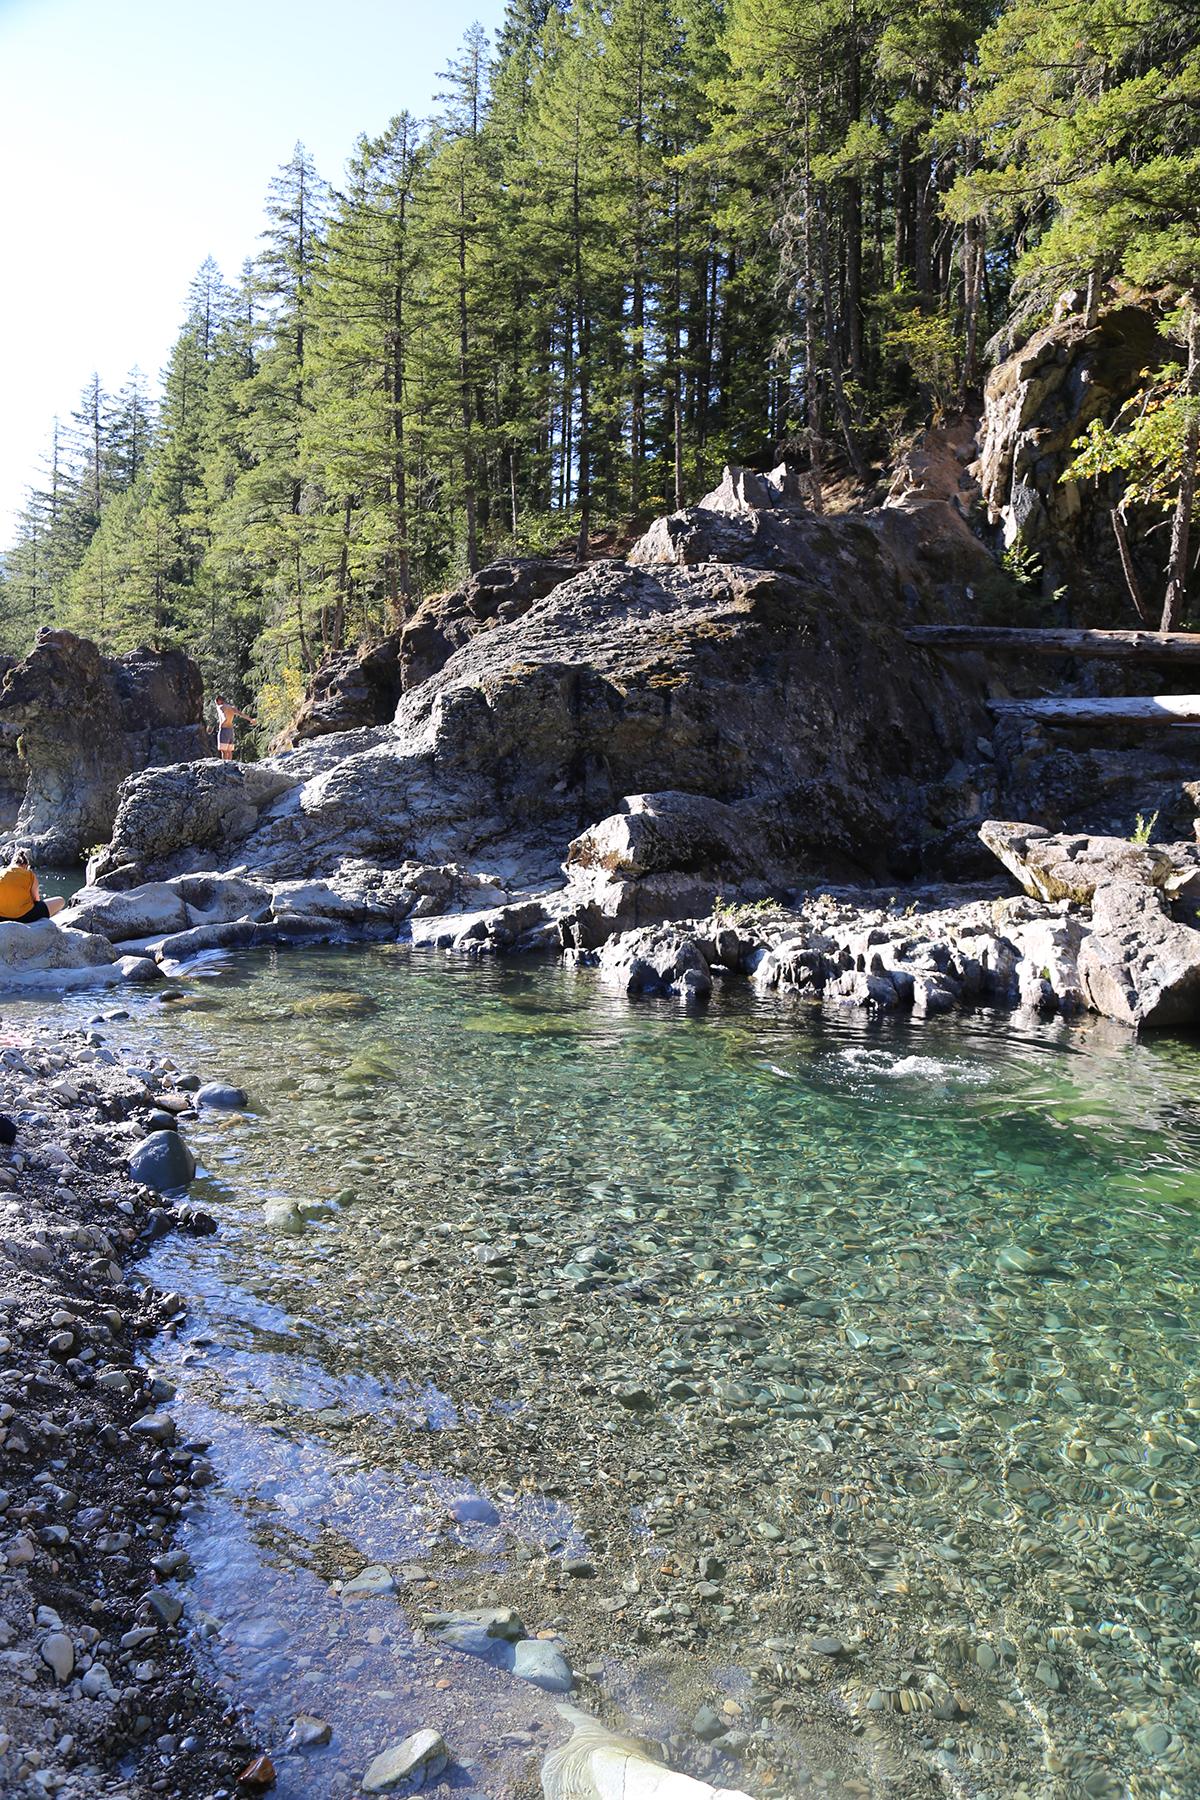 The Explorer's Edit - Three Pools Day Use Area, Oregon